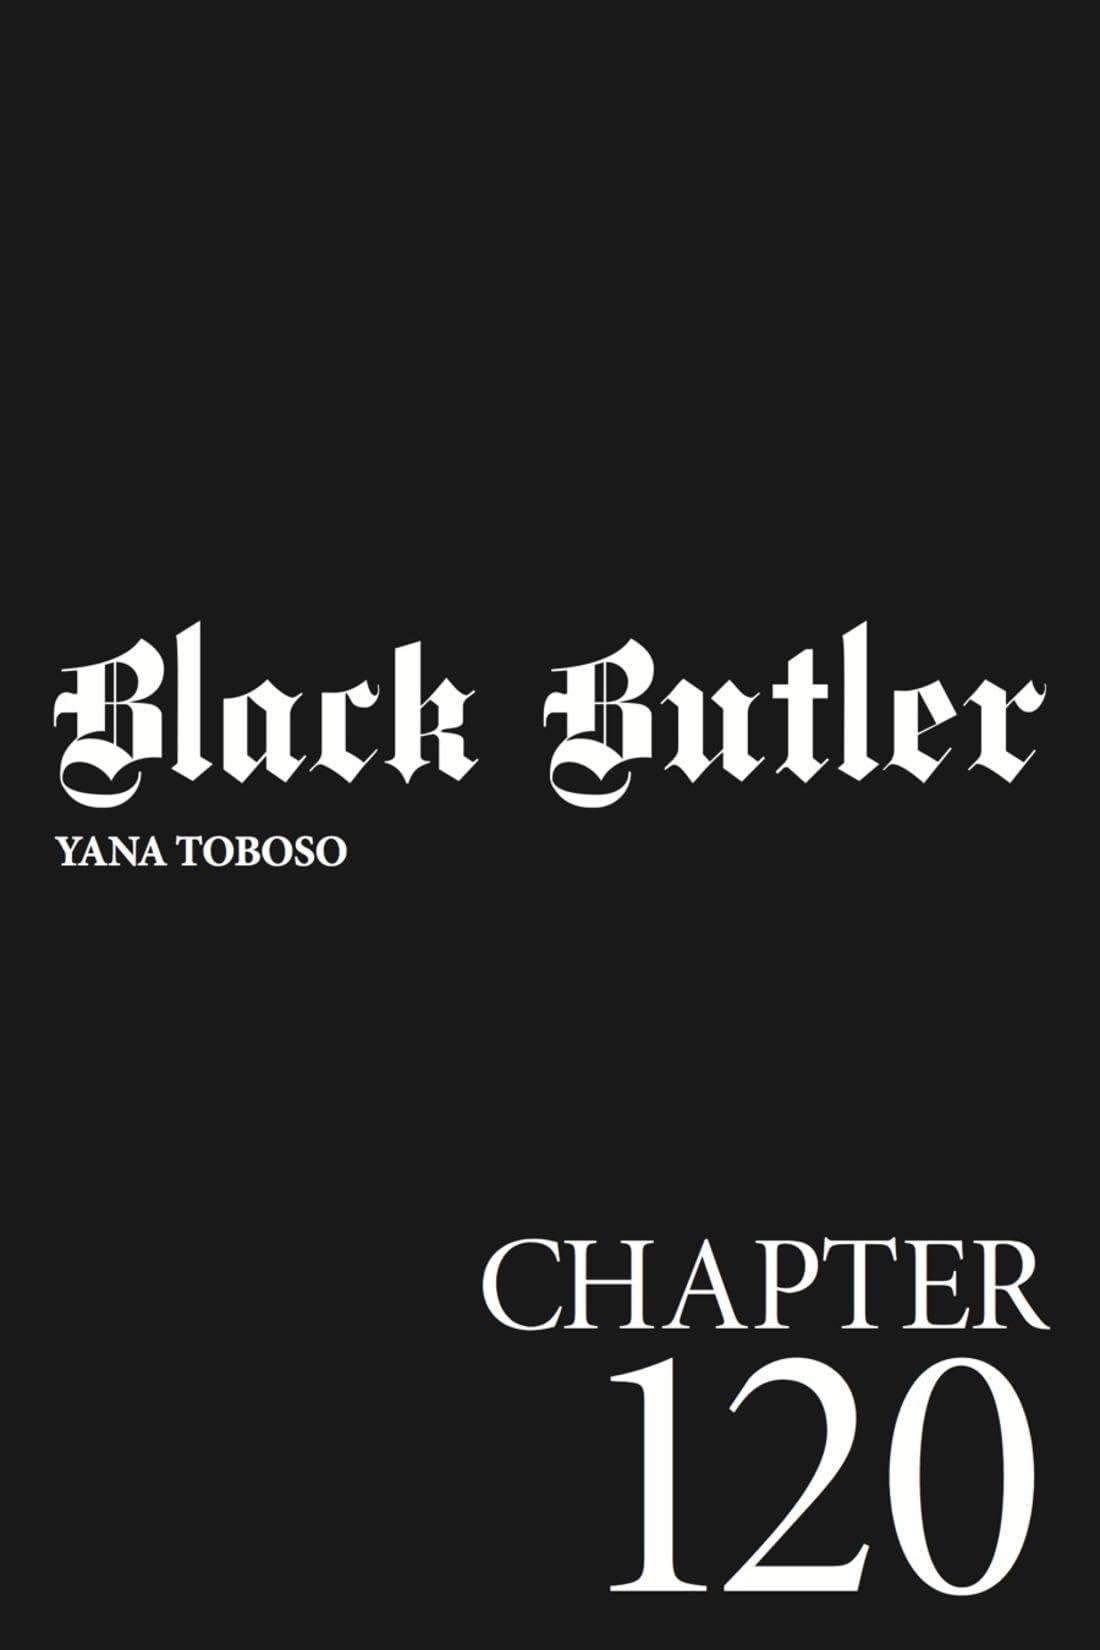 Black Butler #120